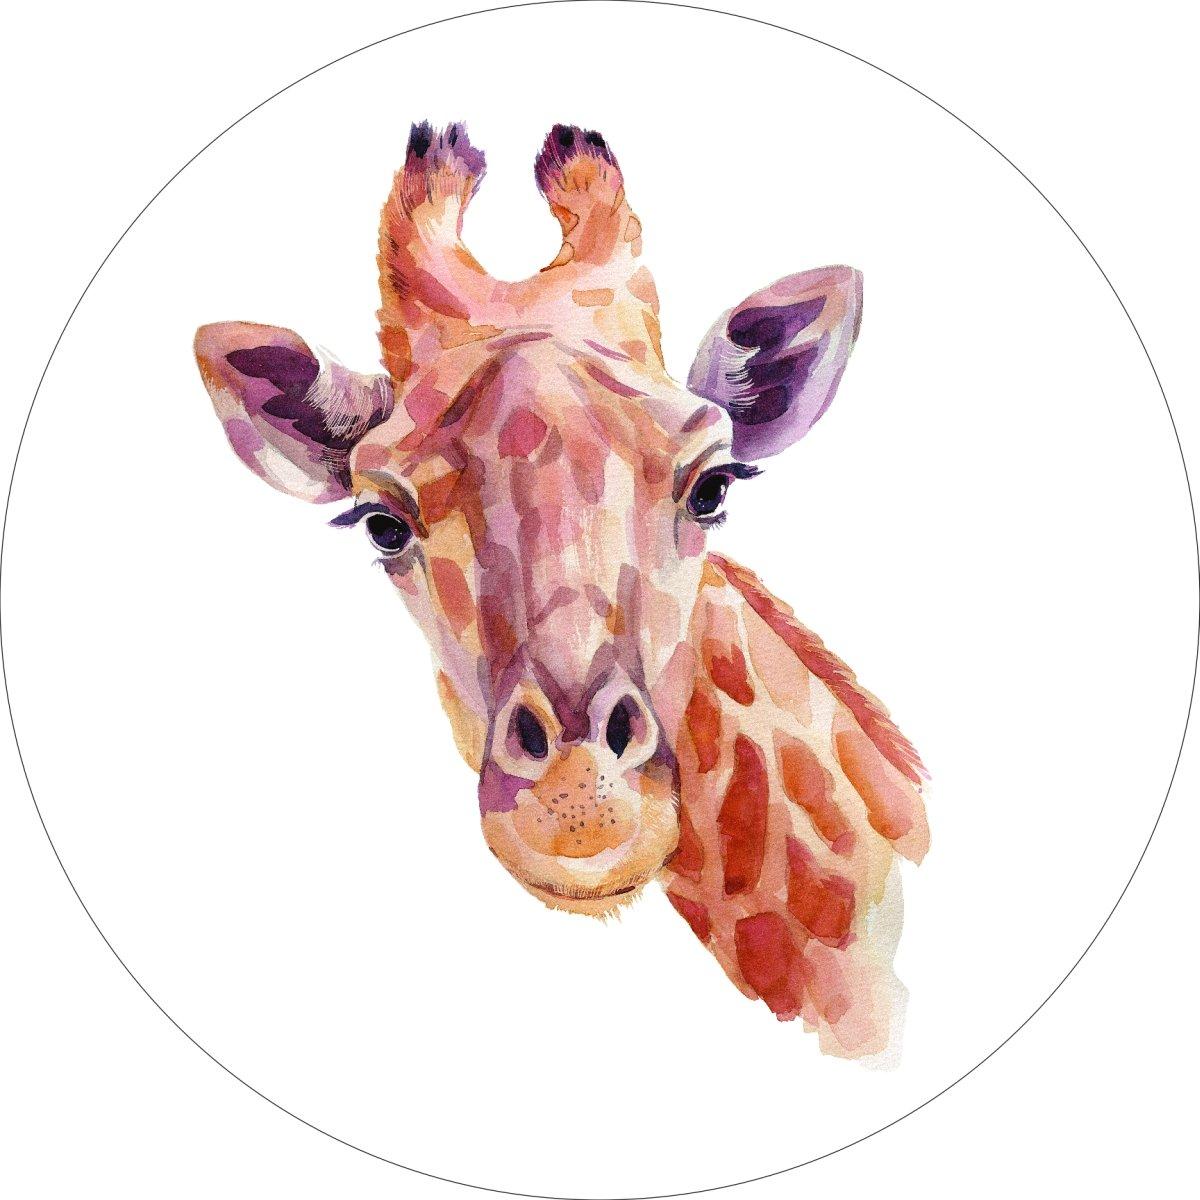 Giraffe Home Wall Shelf Decor Animal Decorations Watercolor Round Sign - 18 Inch, Metal